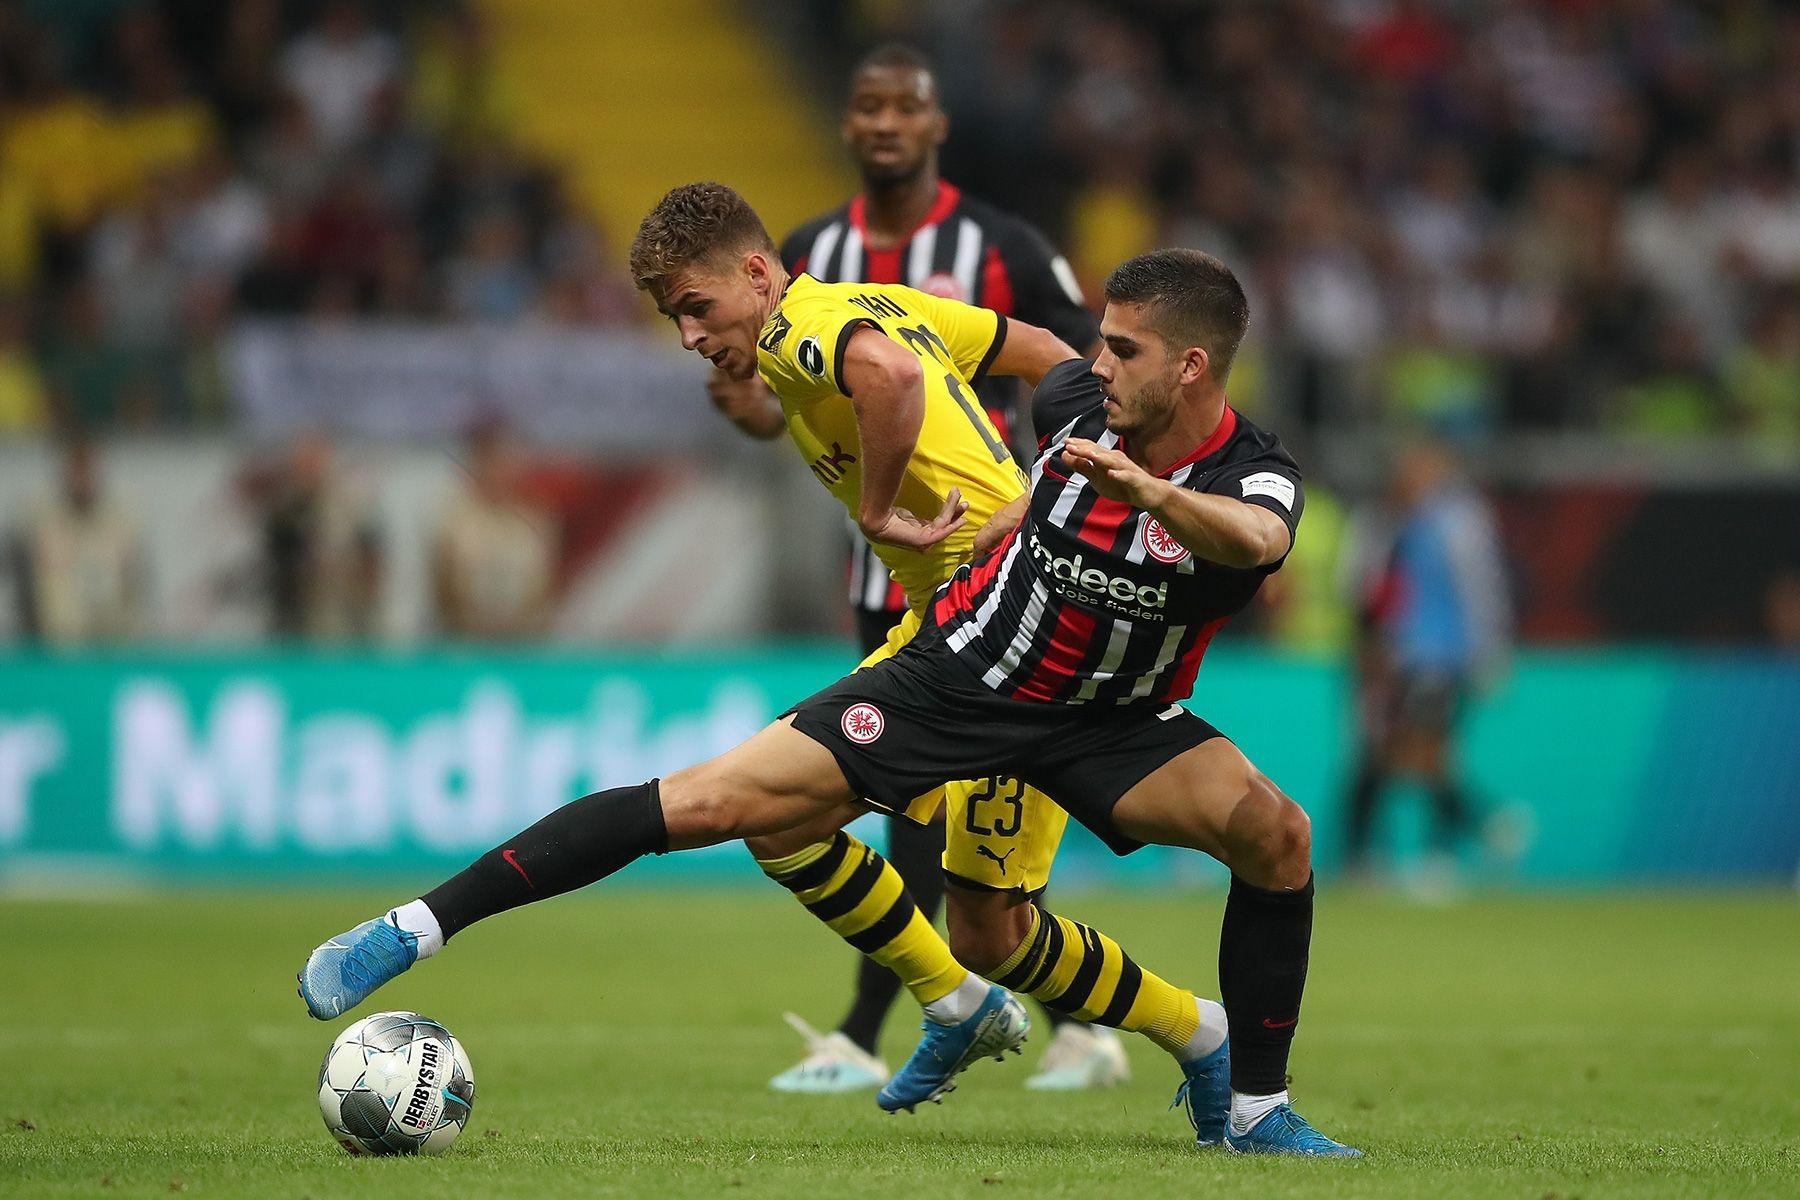 Nhận định, soi kèo Eintracht Frankfurt